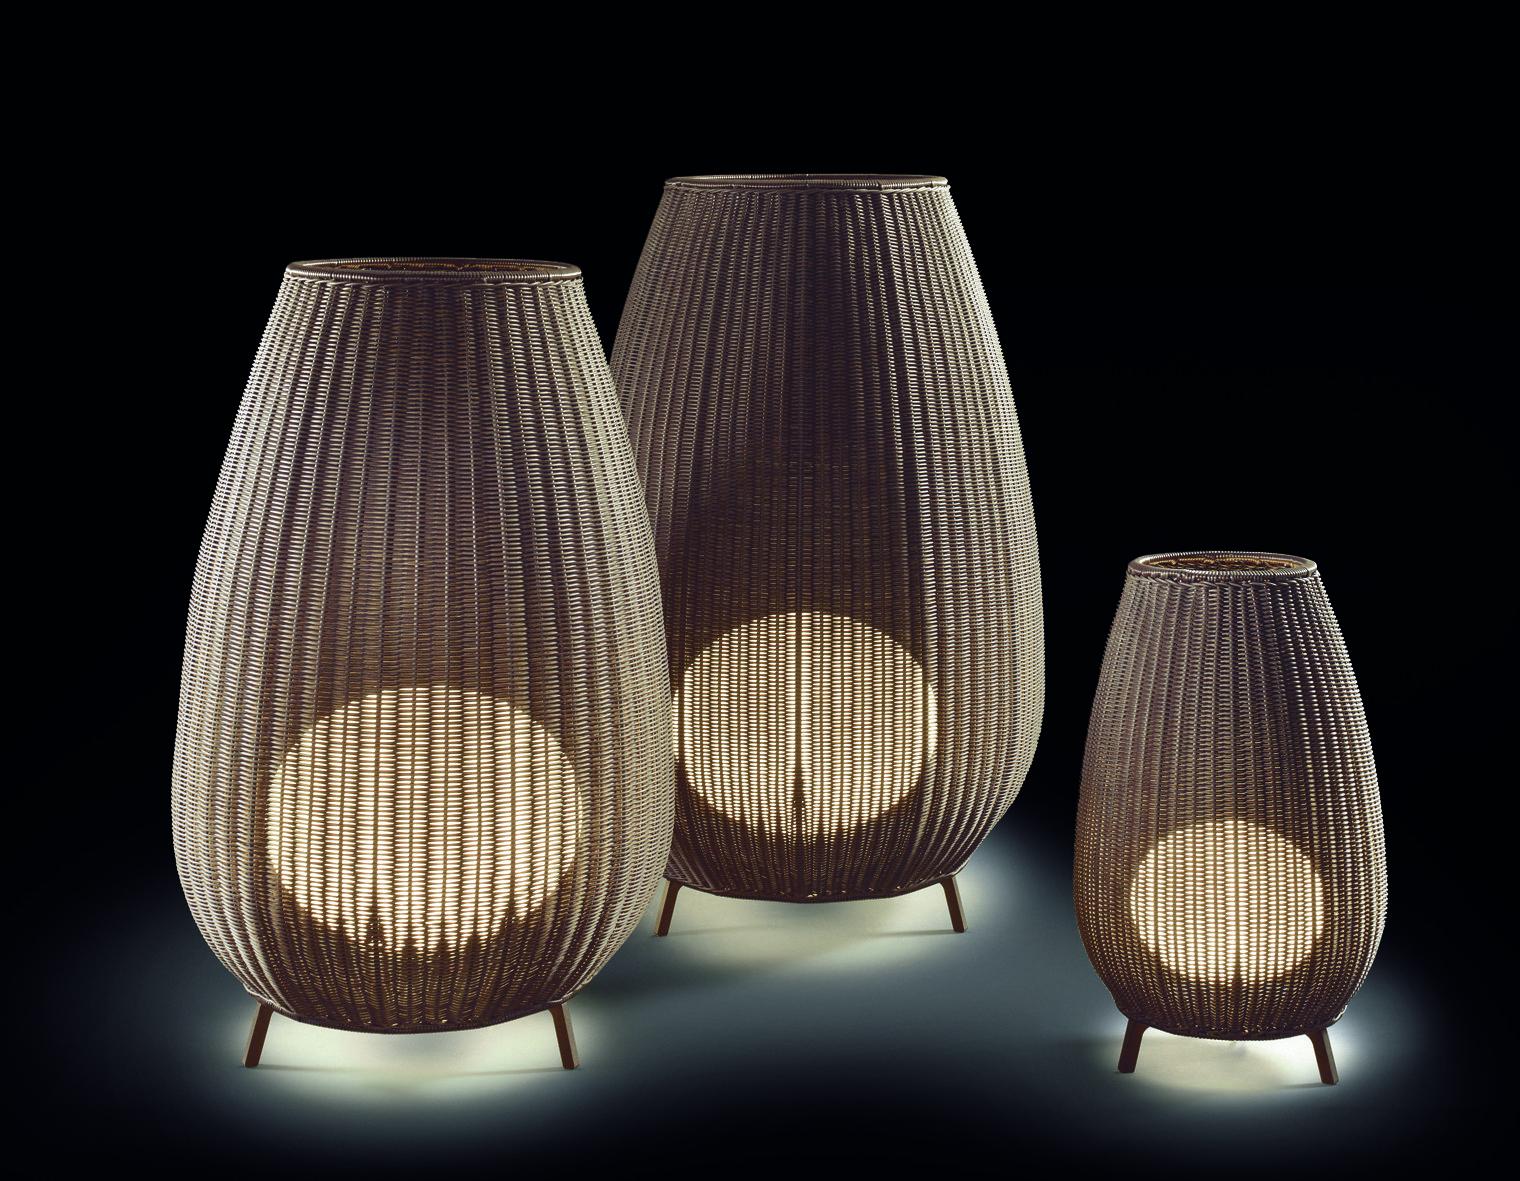 Amphora outdoor light